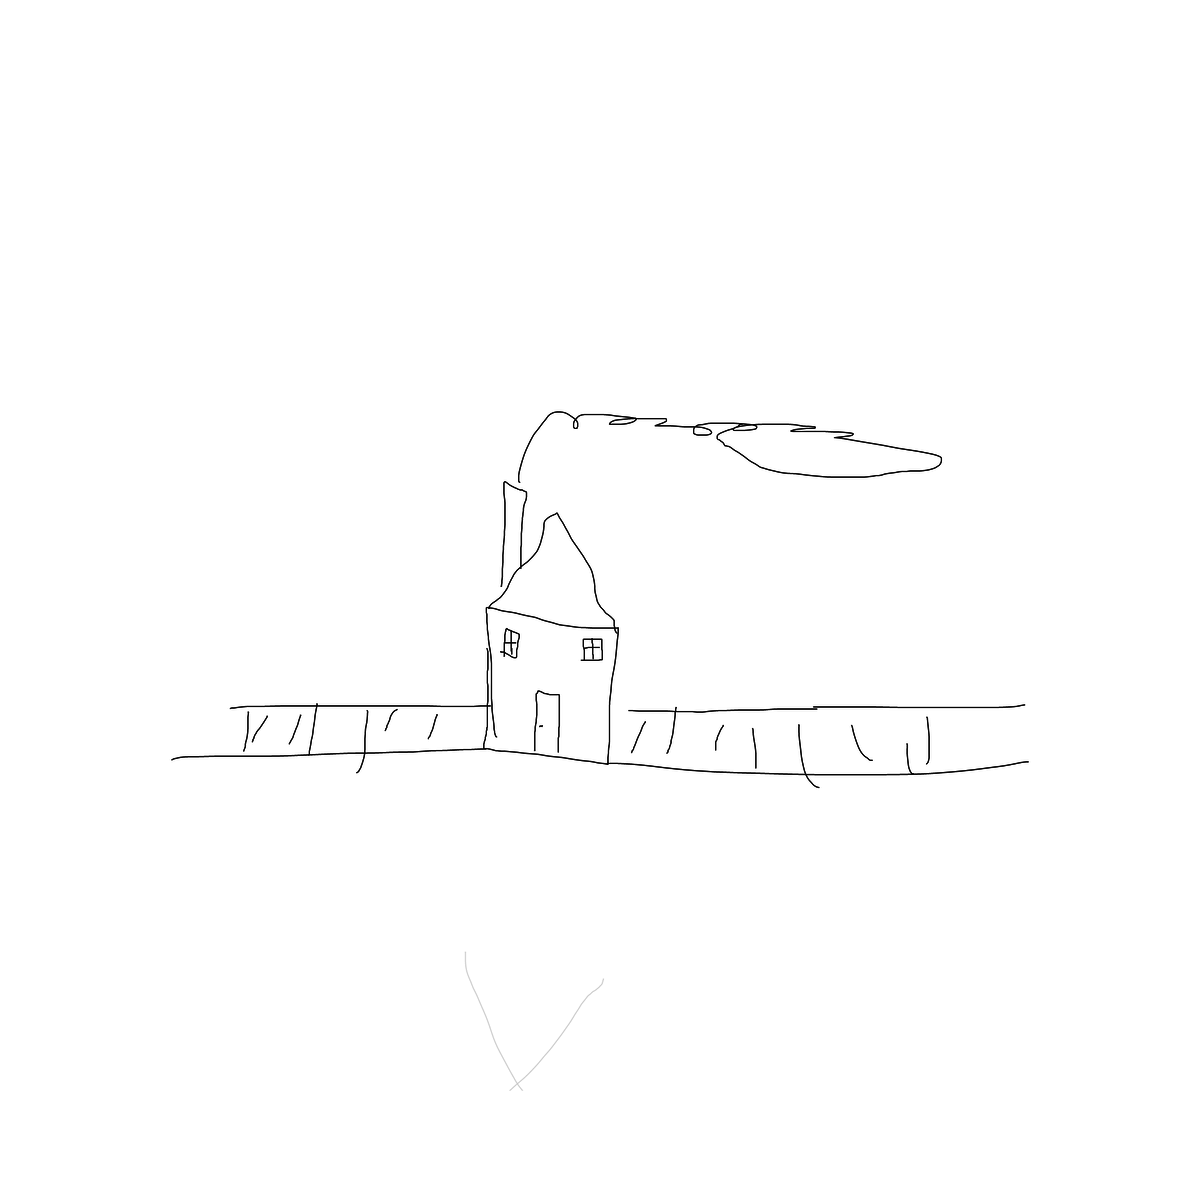 BAAAM drawing#19552 lat:32.1133842468261700lng: 34.7900657653808600